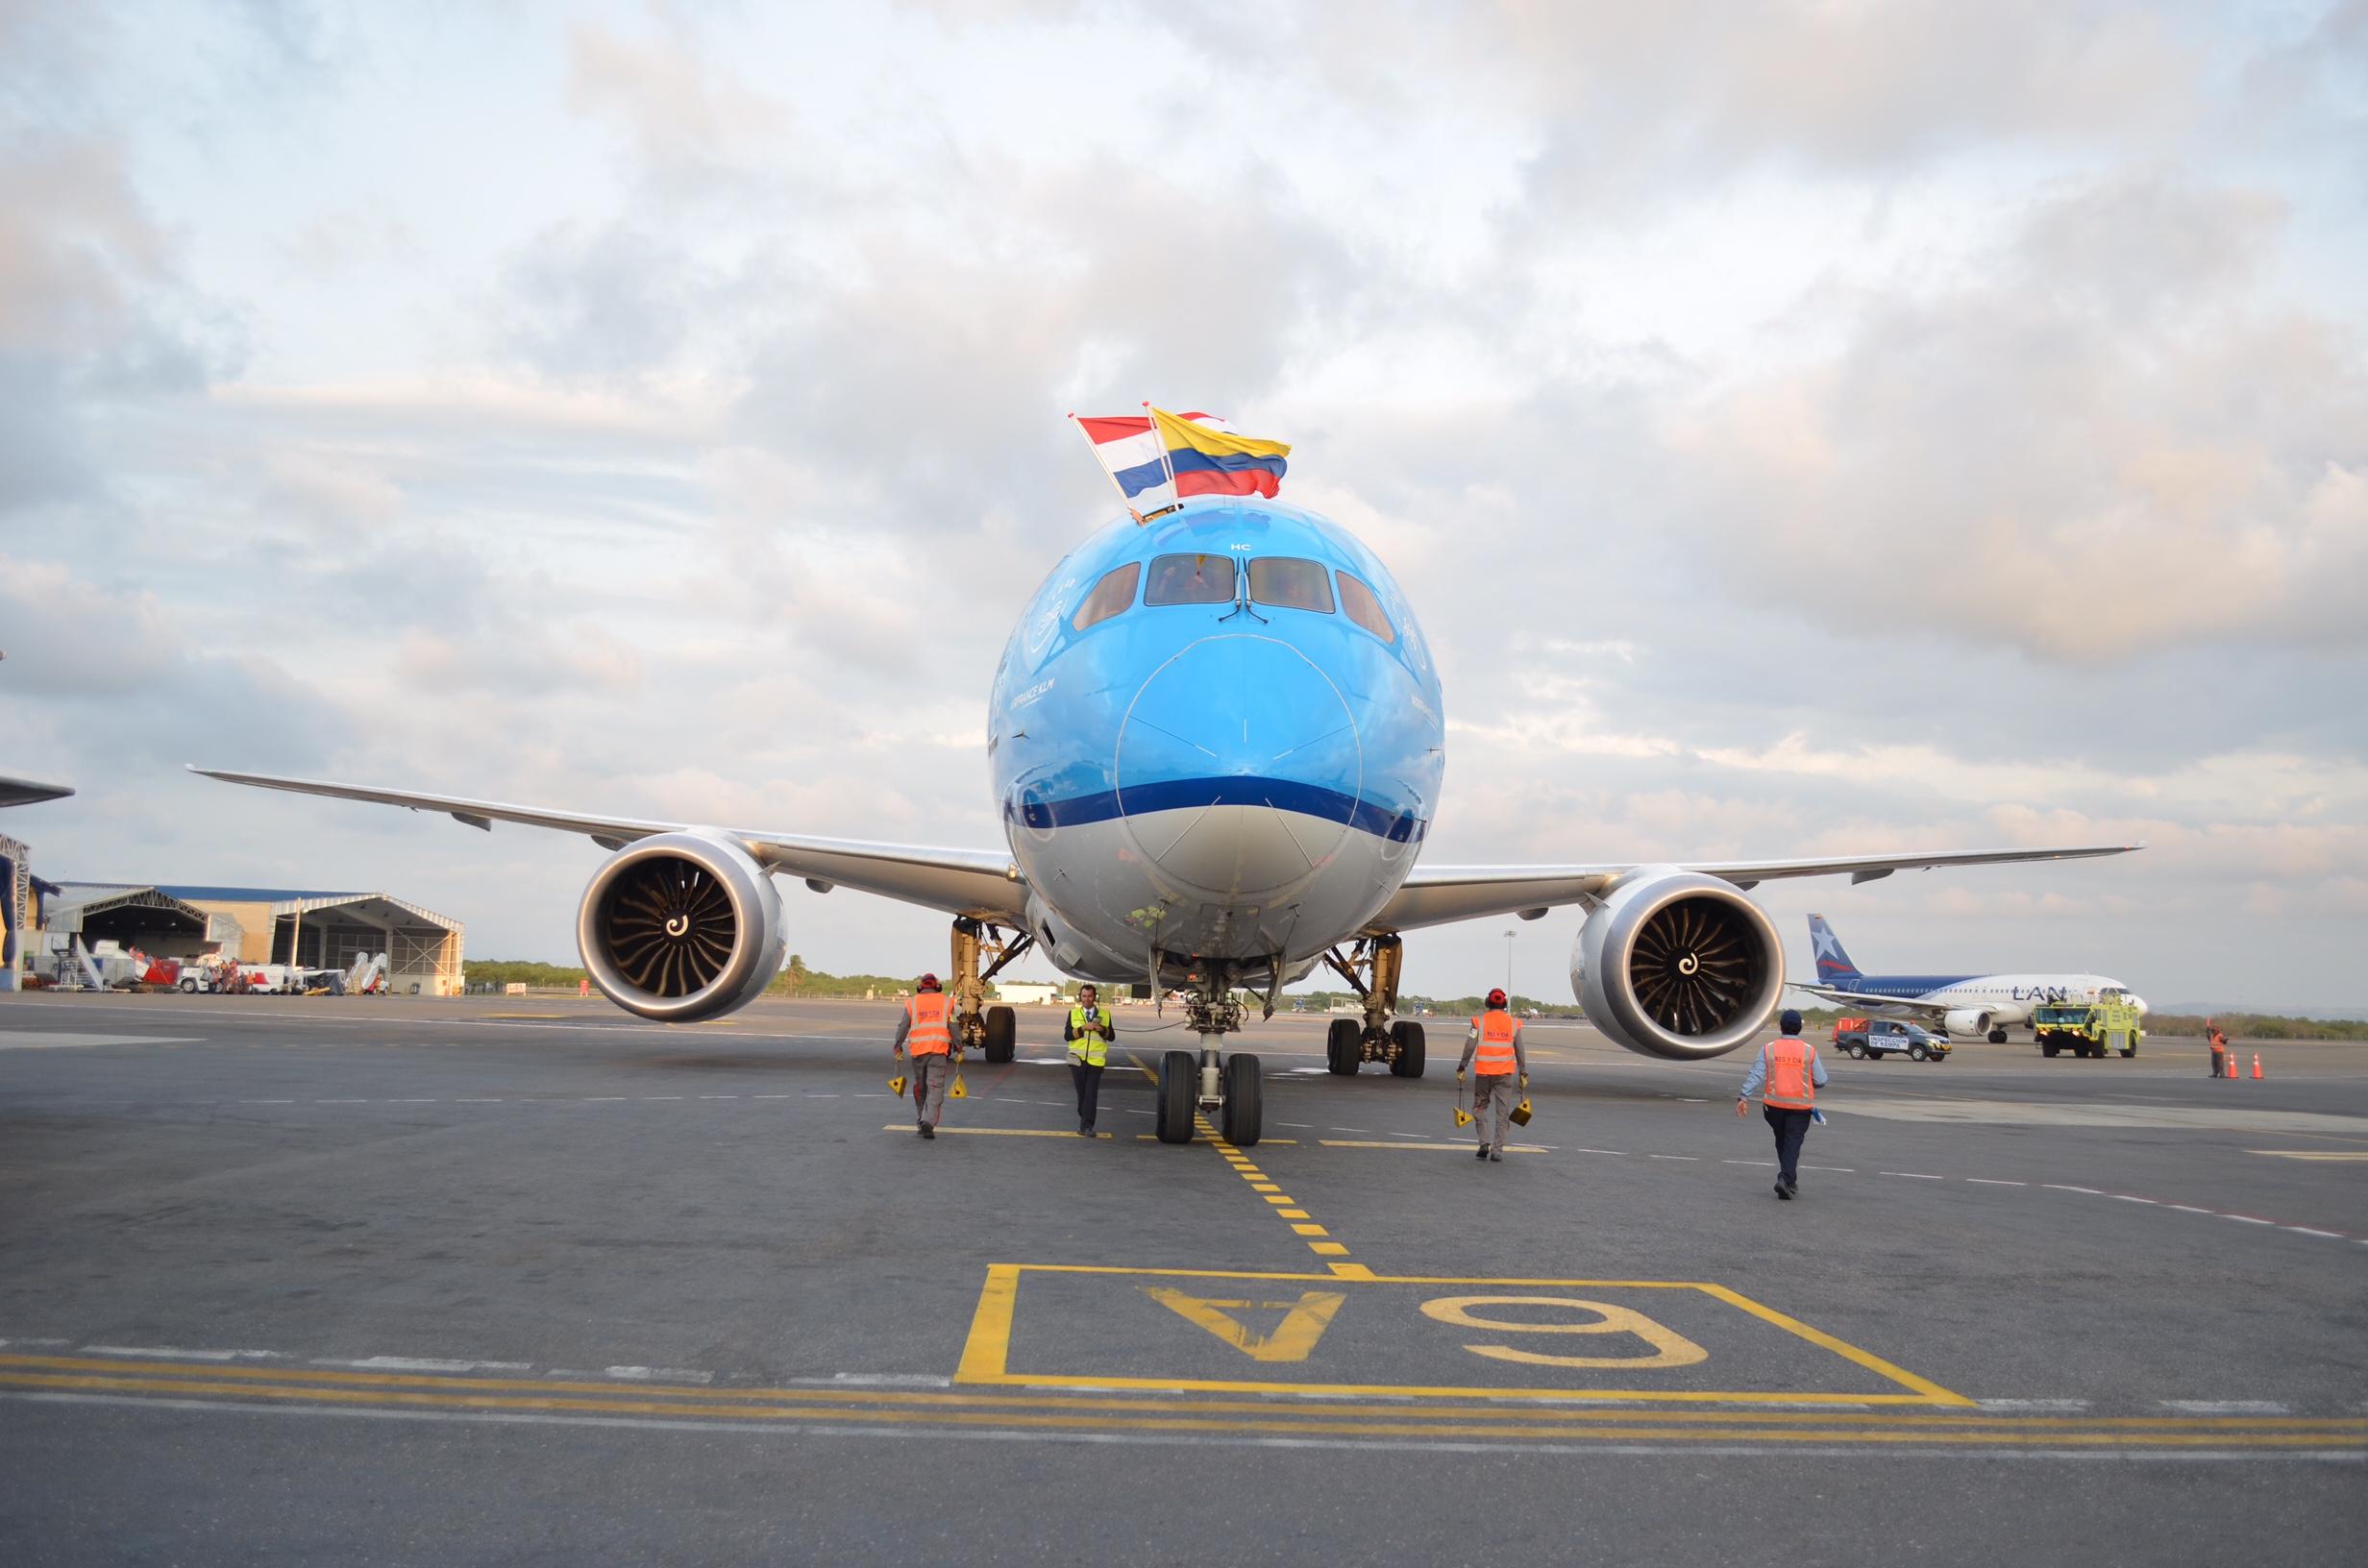 ¡Llegó KLM a Cartagena!